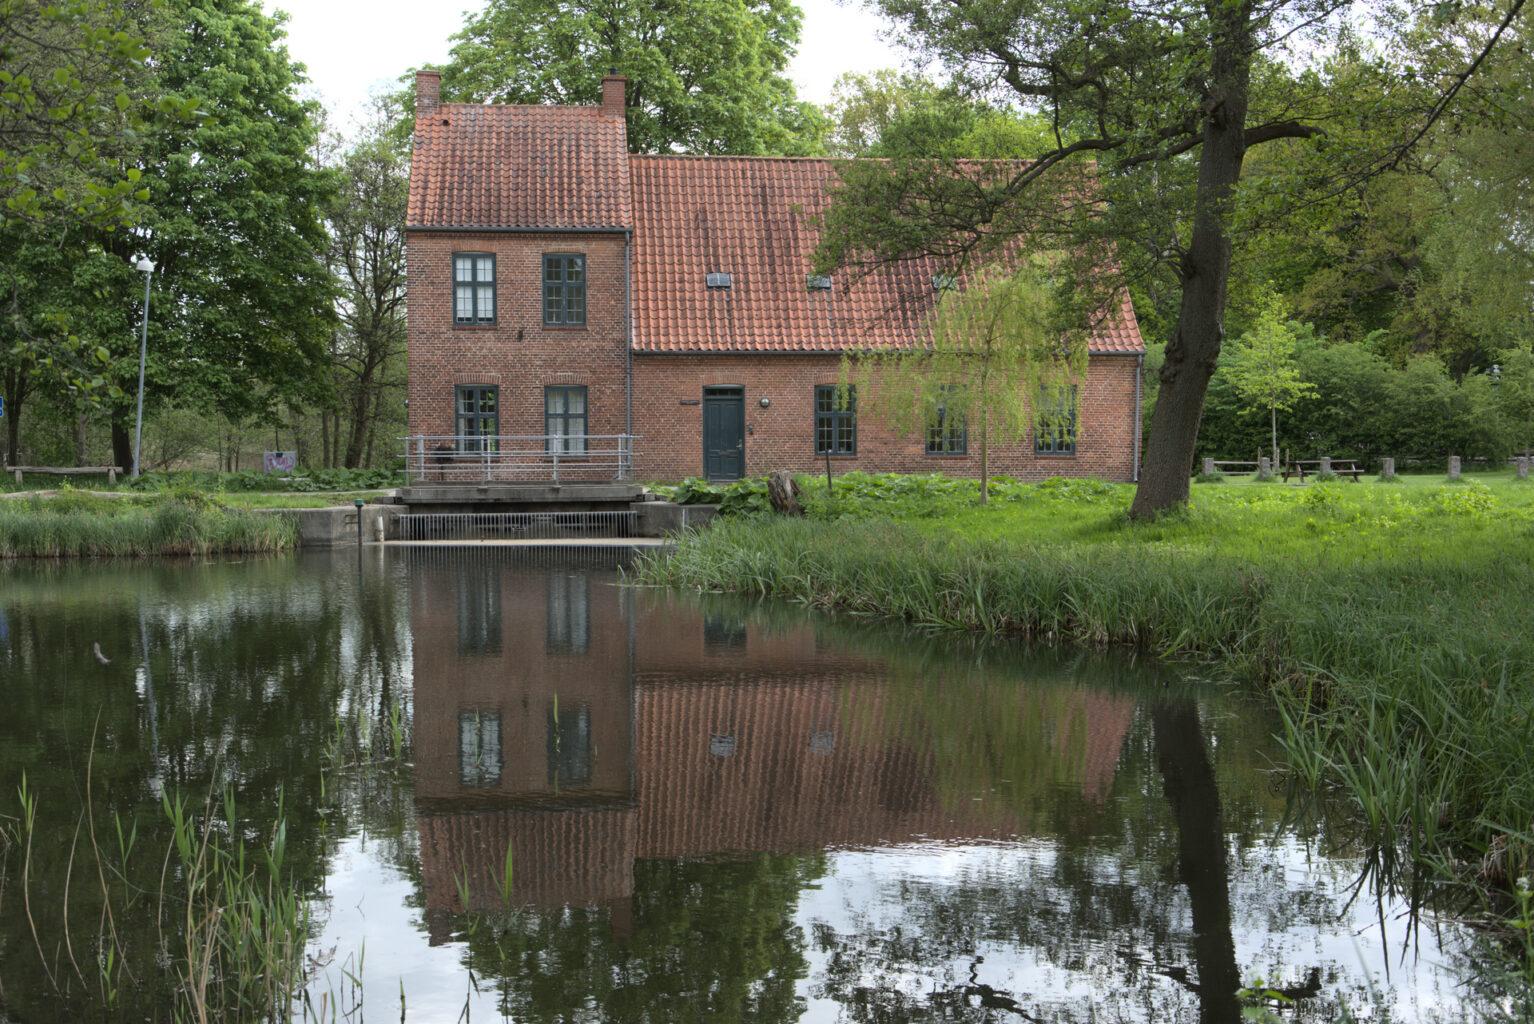 Fuglevad water mill